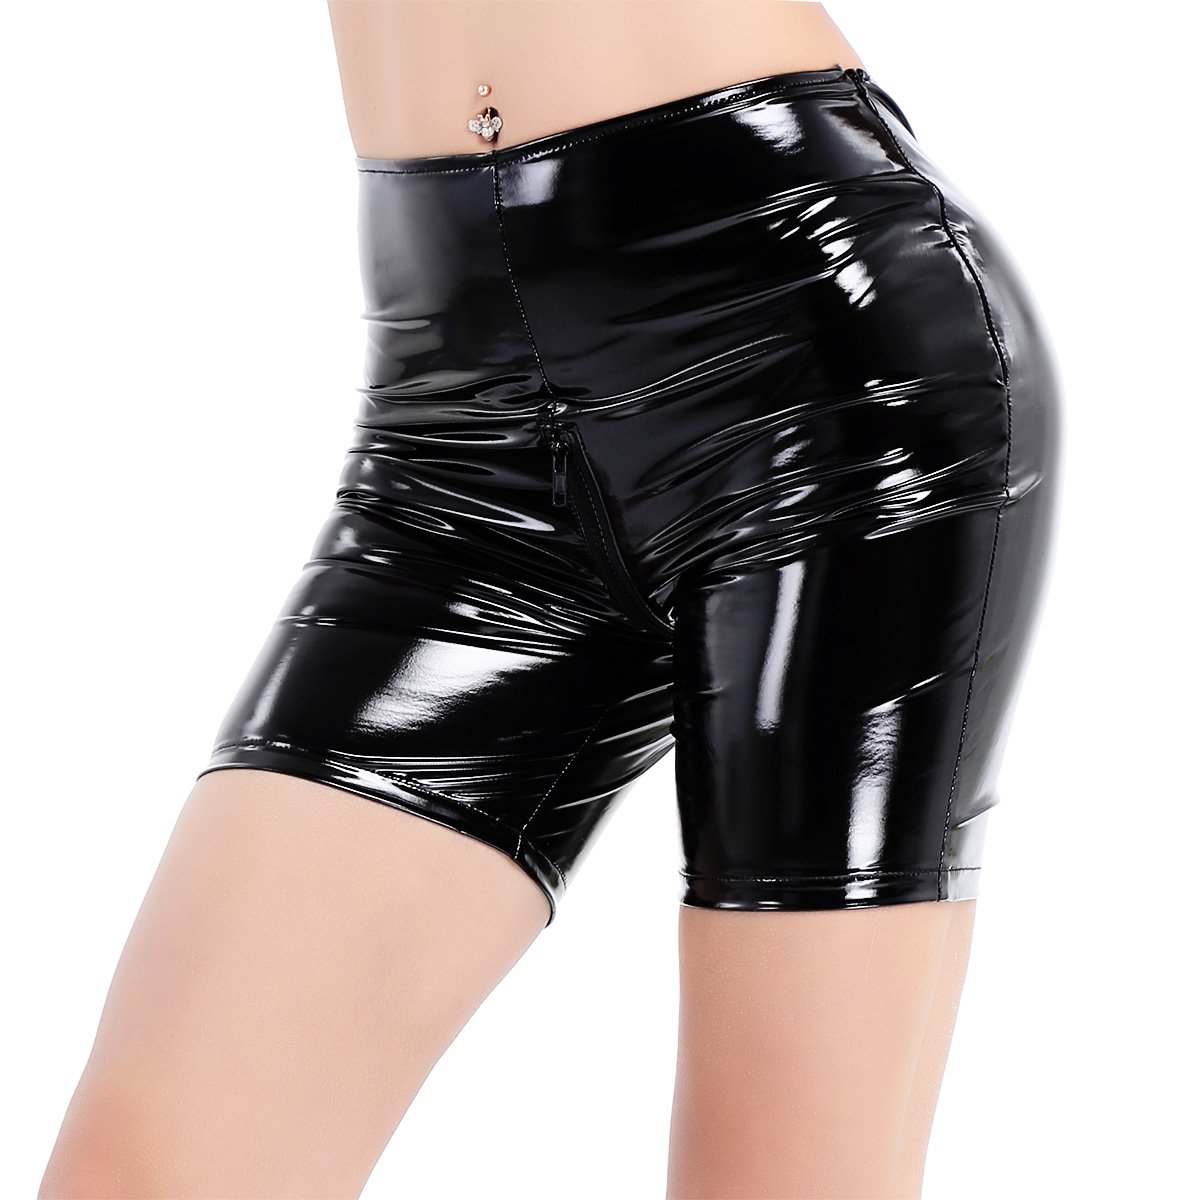 MSemis Women's Wetlook Zipper Crotch PVC Leather Tight Pants Boxer Shorts Black Medium (Waistline 27.0'',Hip 32.0'')